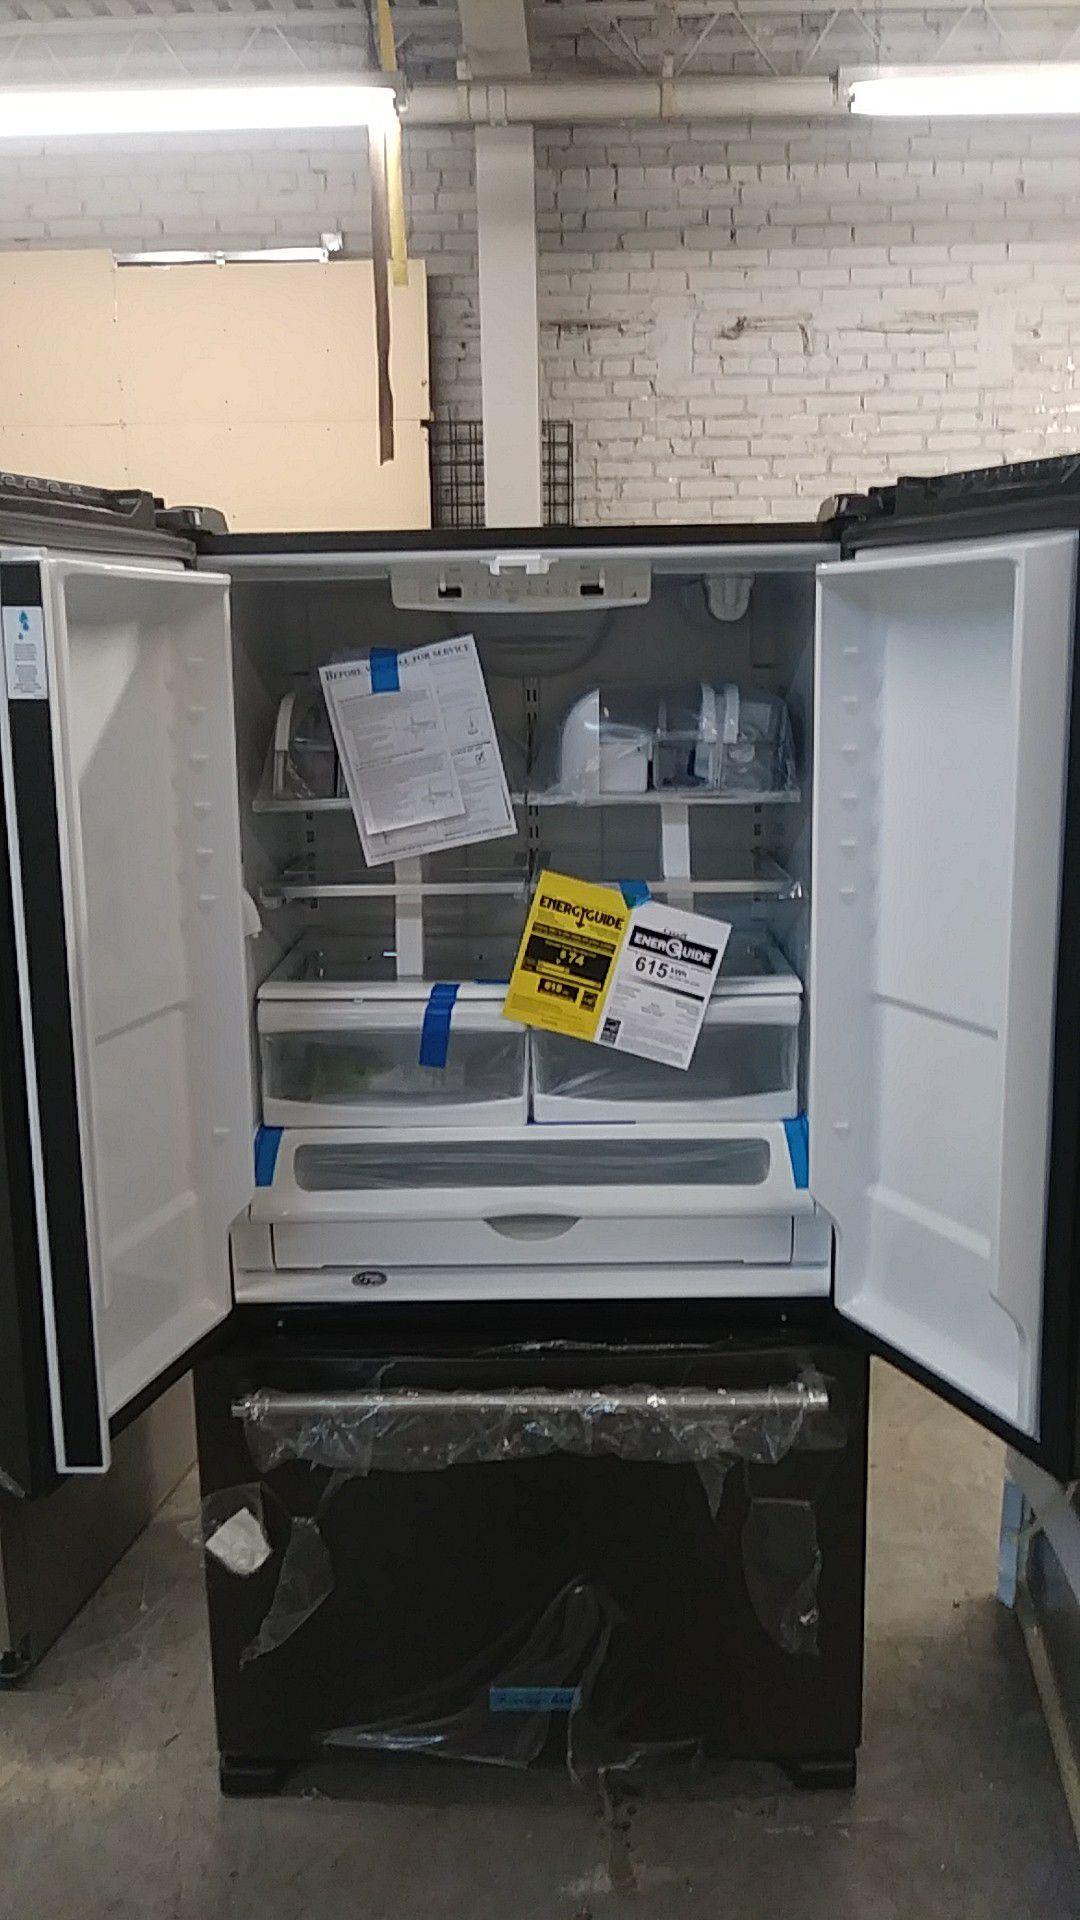 New KitchenAid black stainless steel fridge